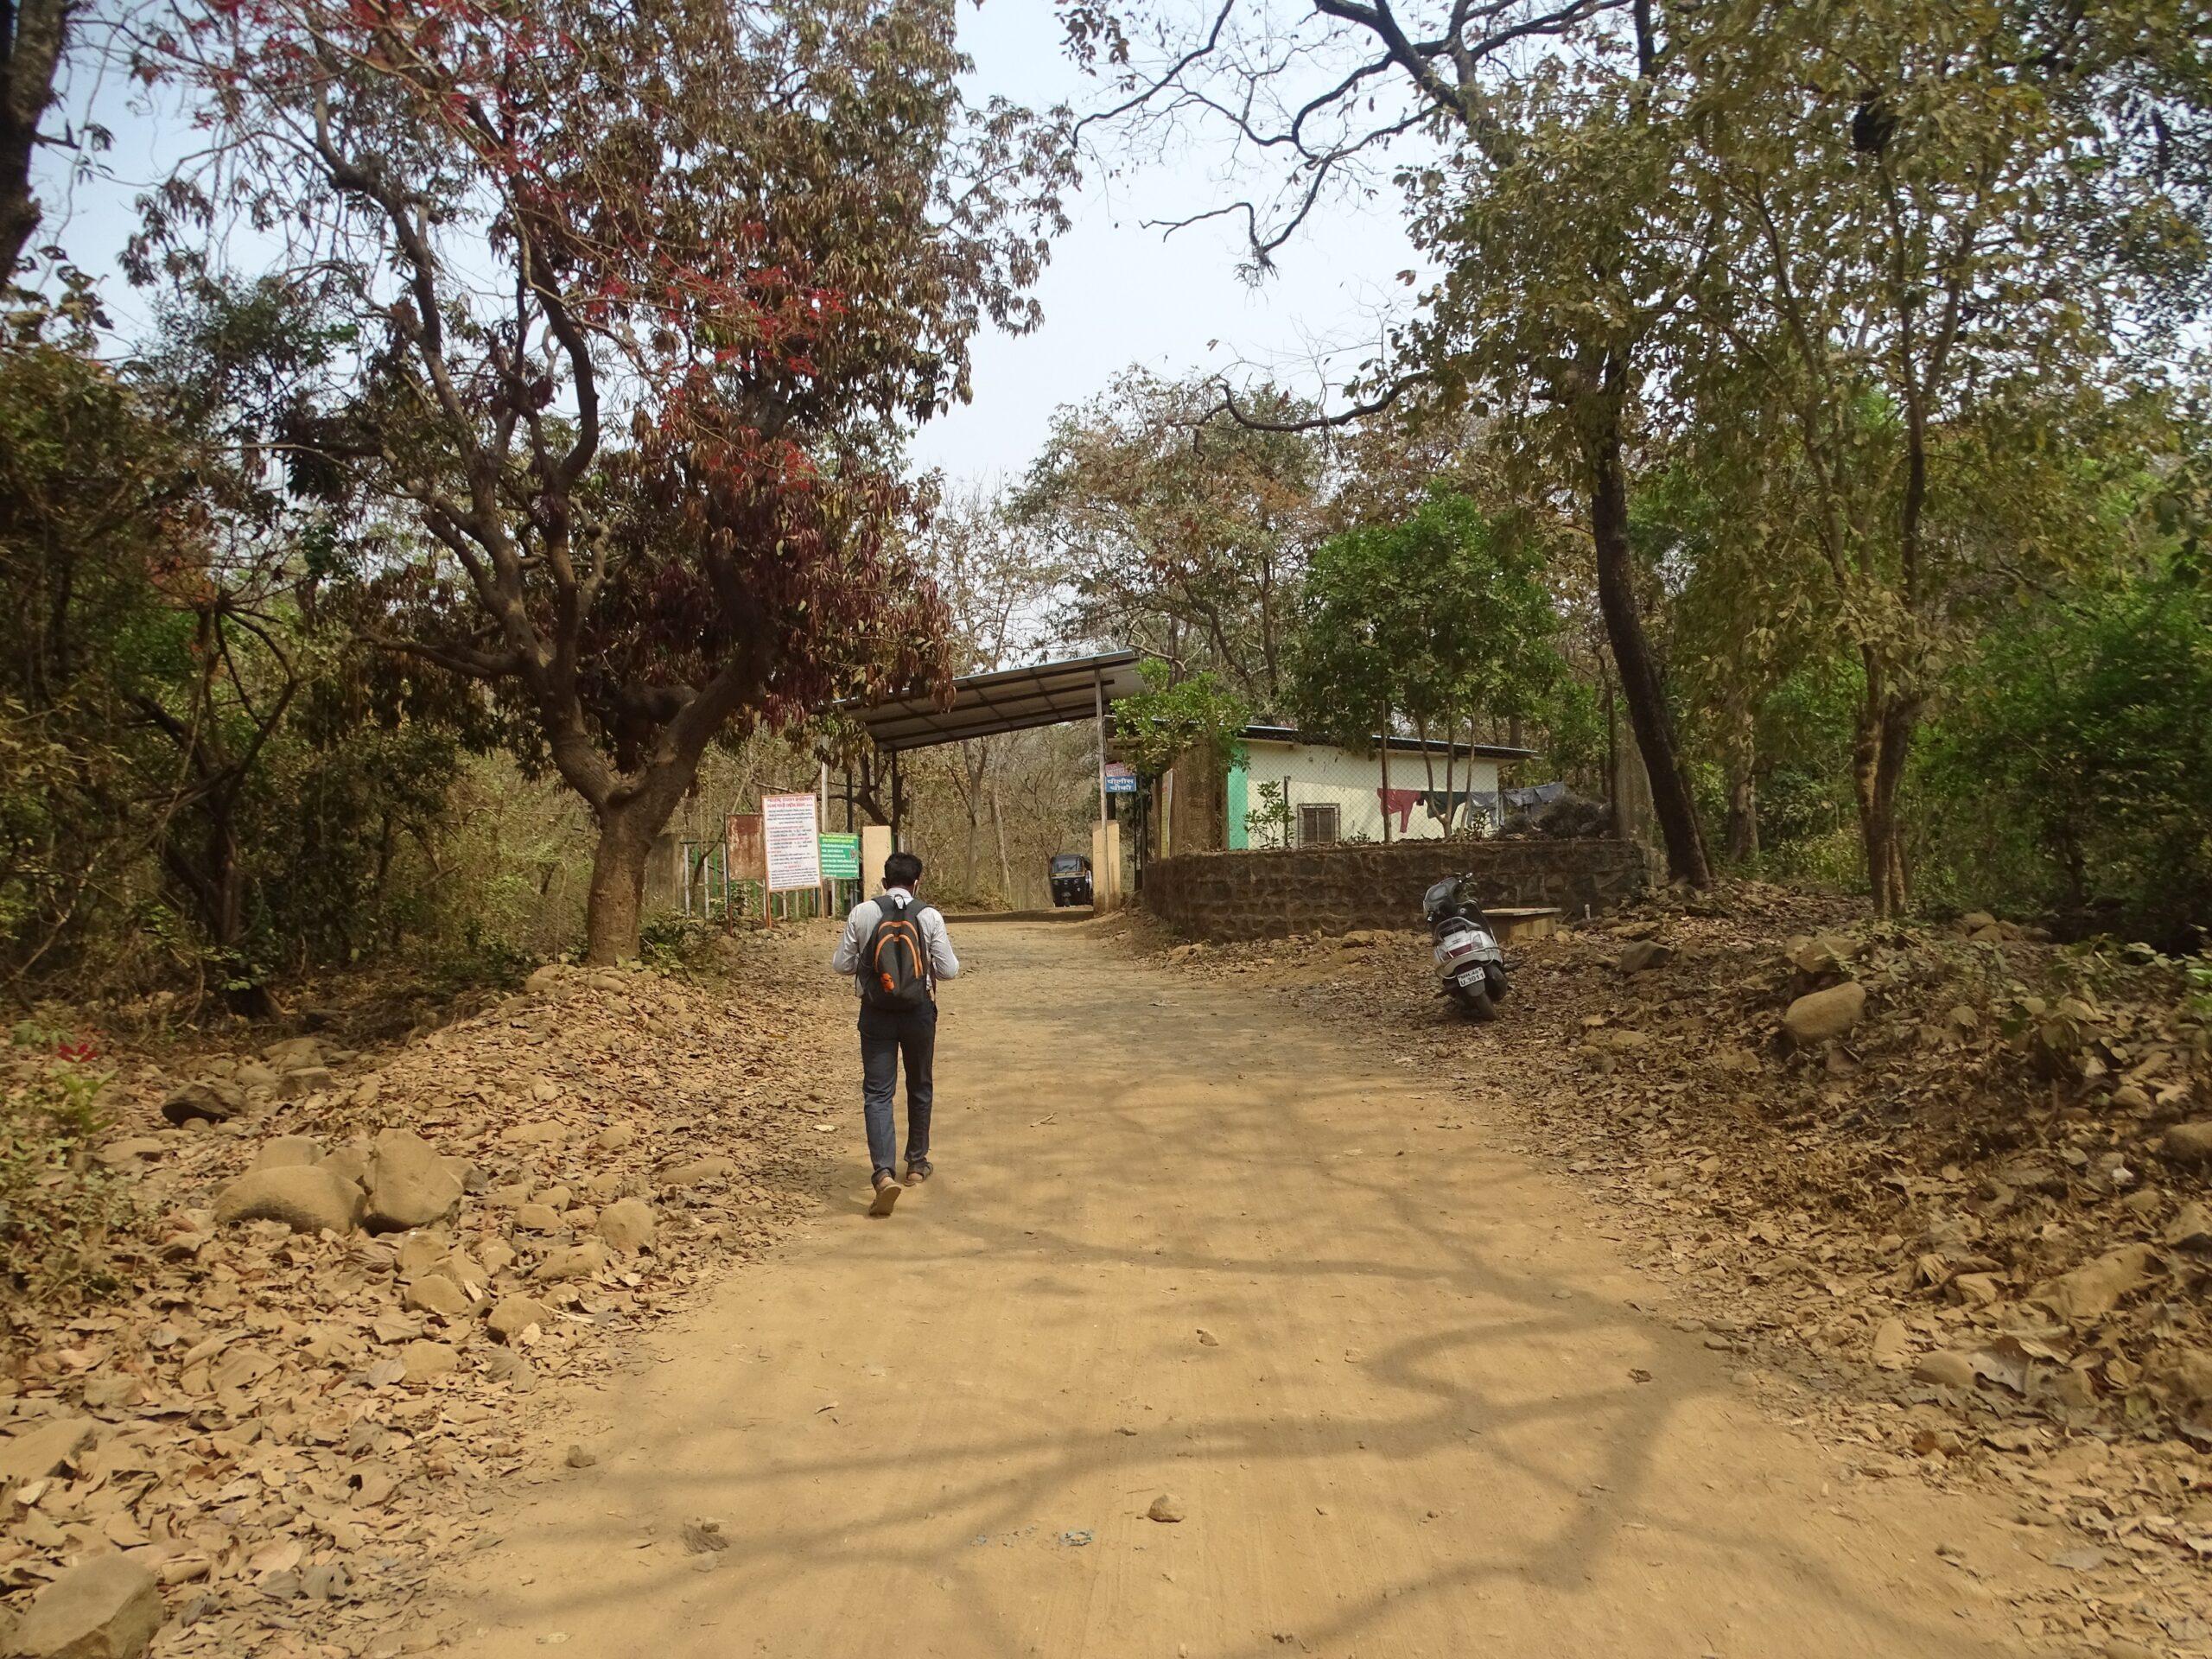 Tungareshwar Forest Gate, Vasai East, Palghar, Maharashtra, India